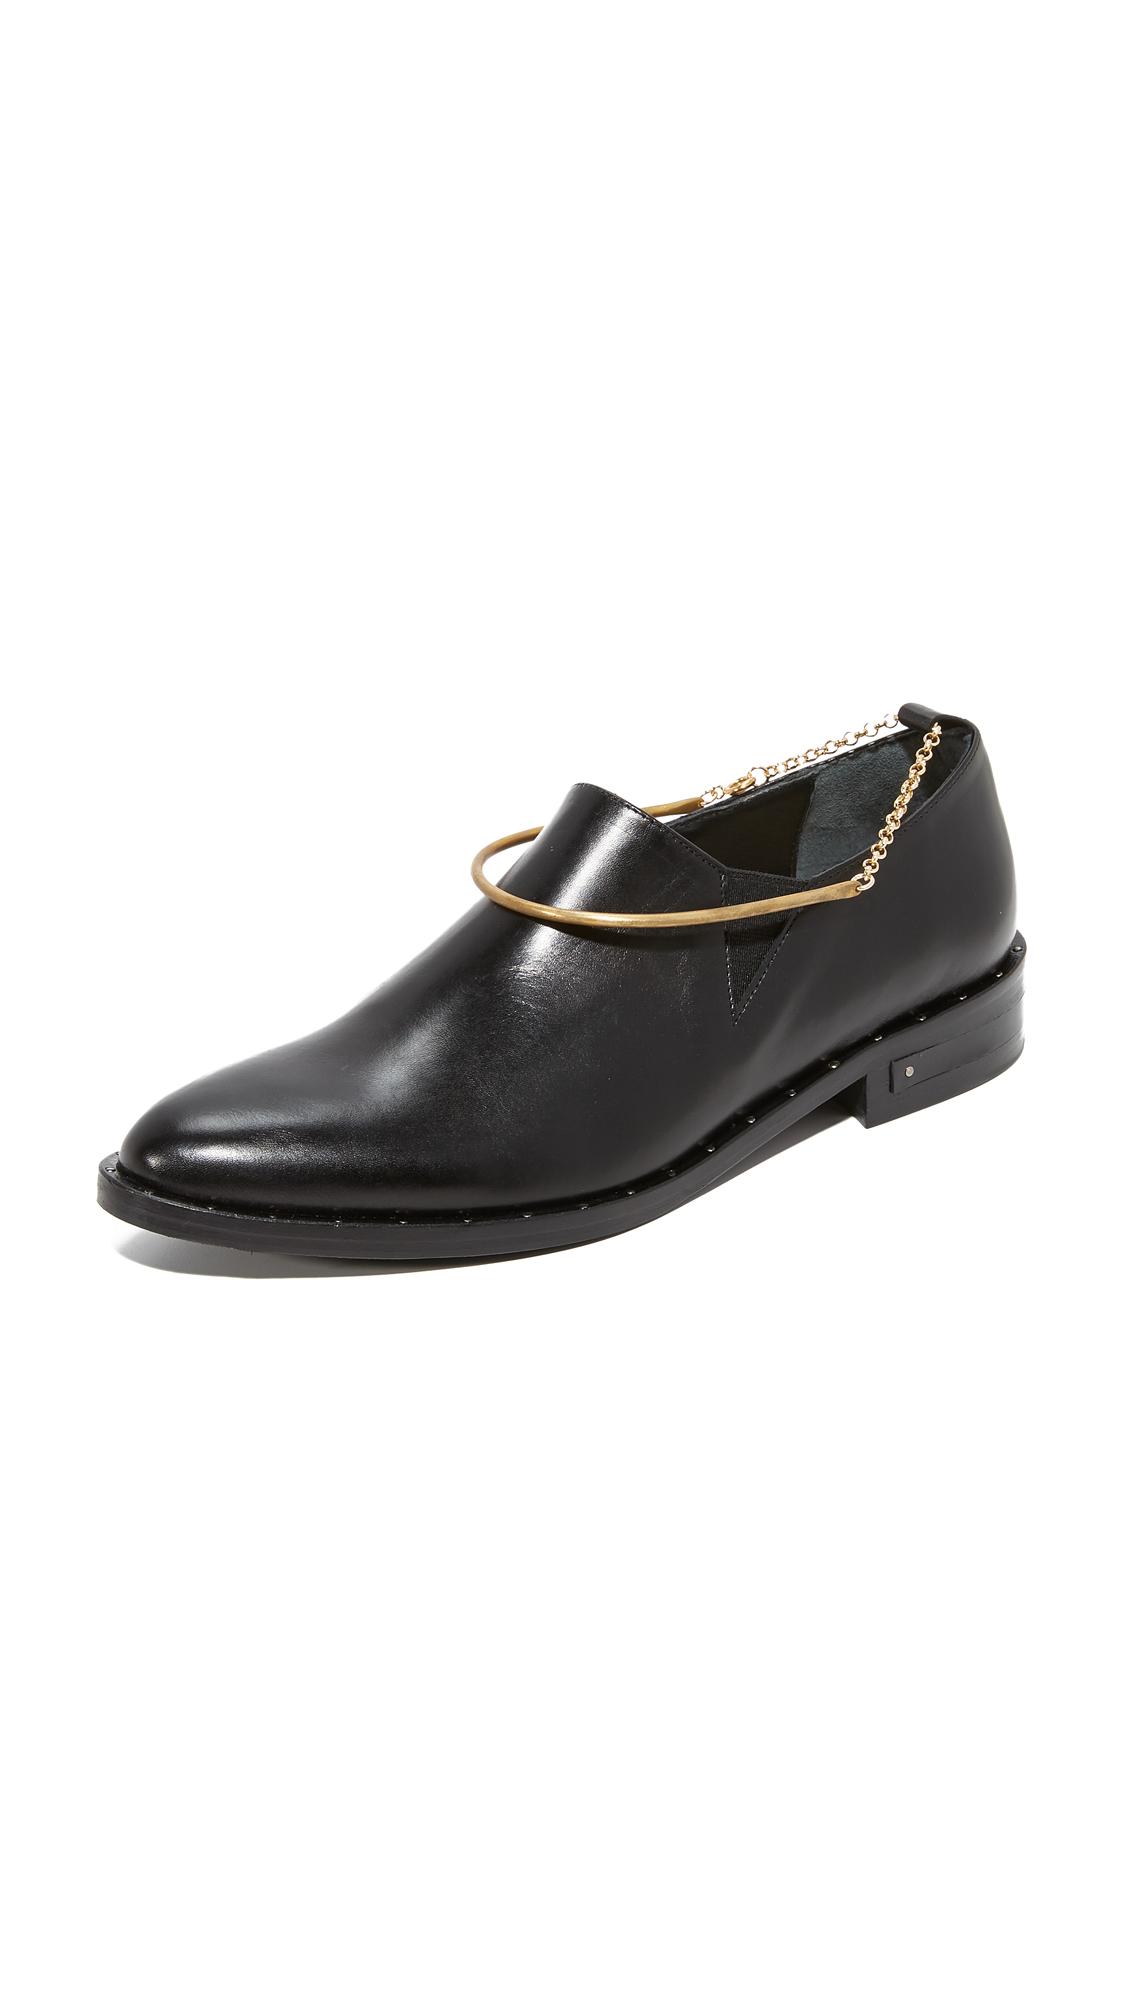 Freda Salvador Sound Loafer Booties with Anklet - Black